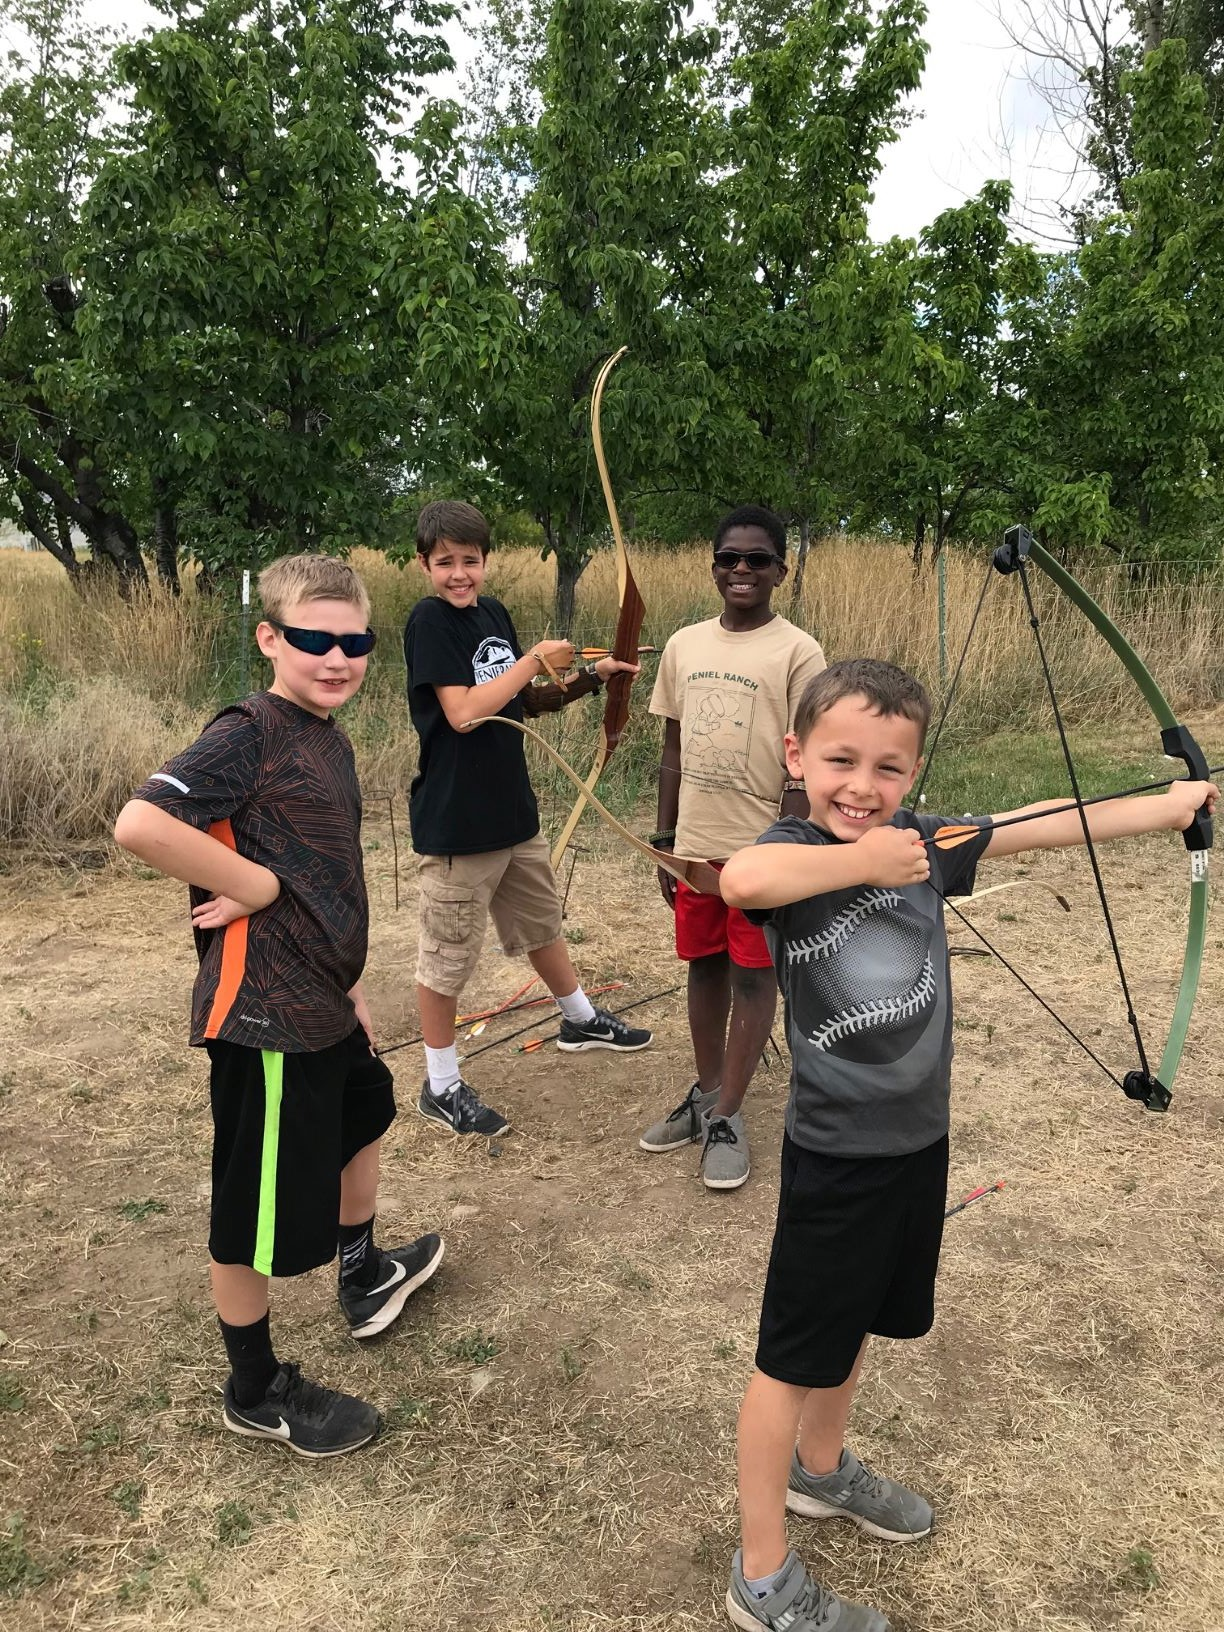 Boys at archery